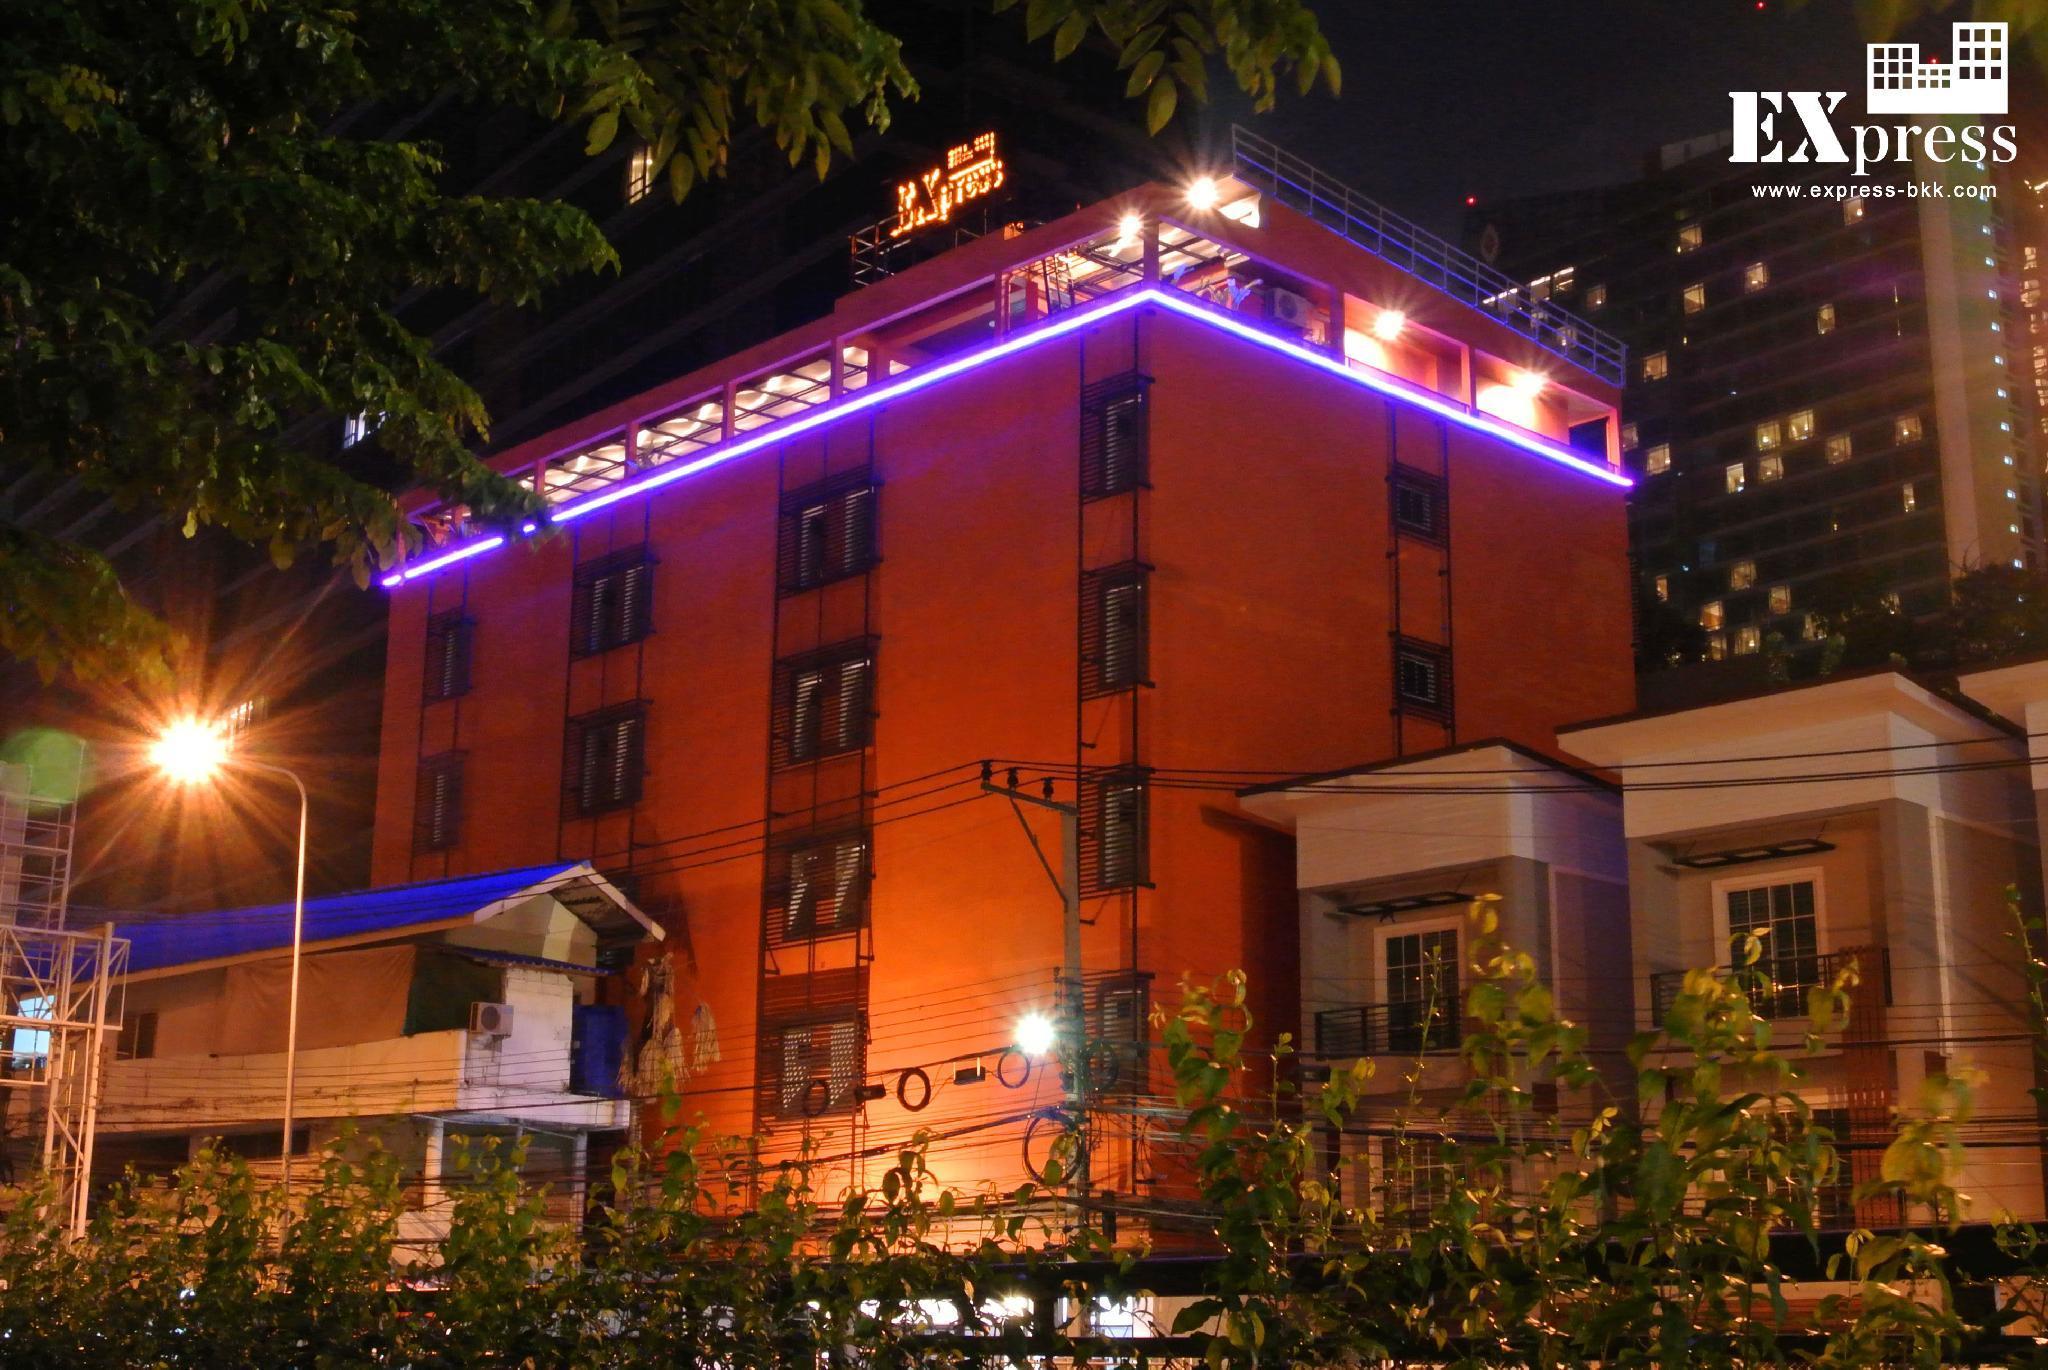 The Express Bangkok Hostel